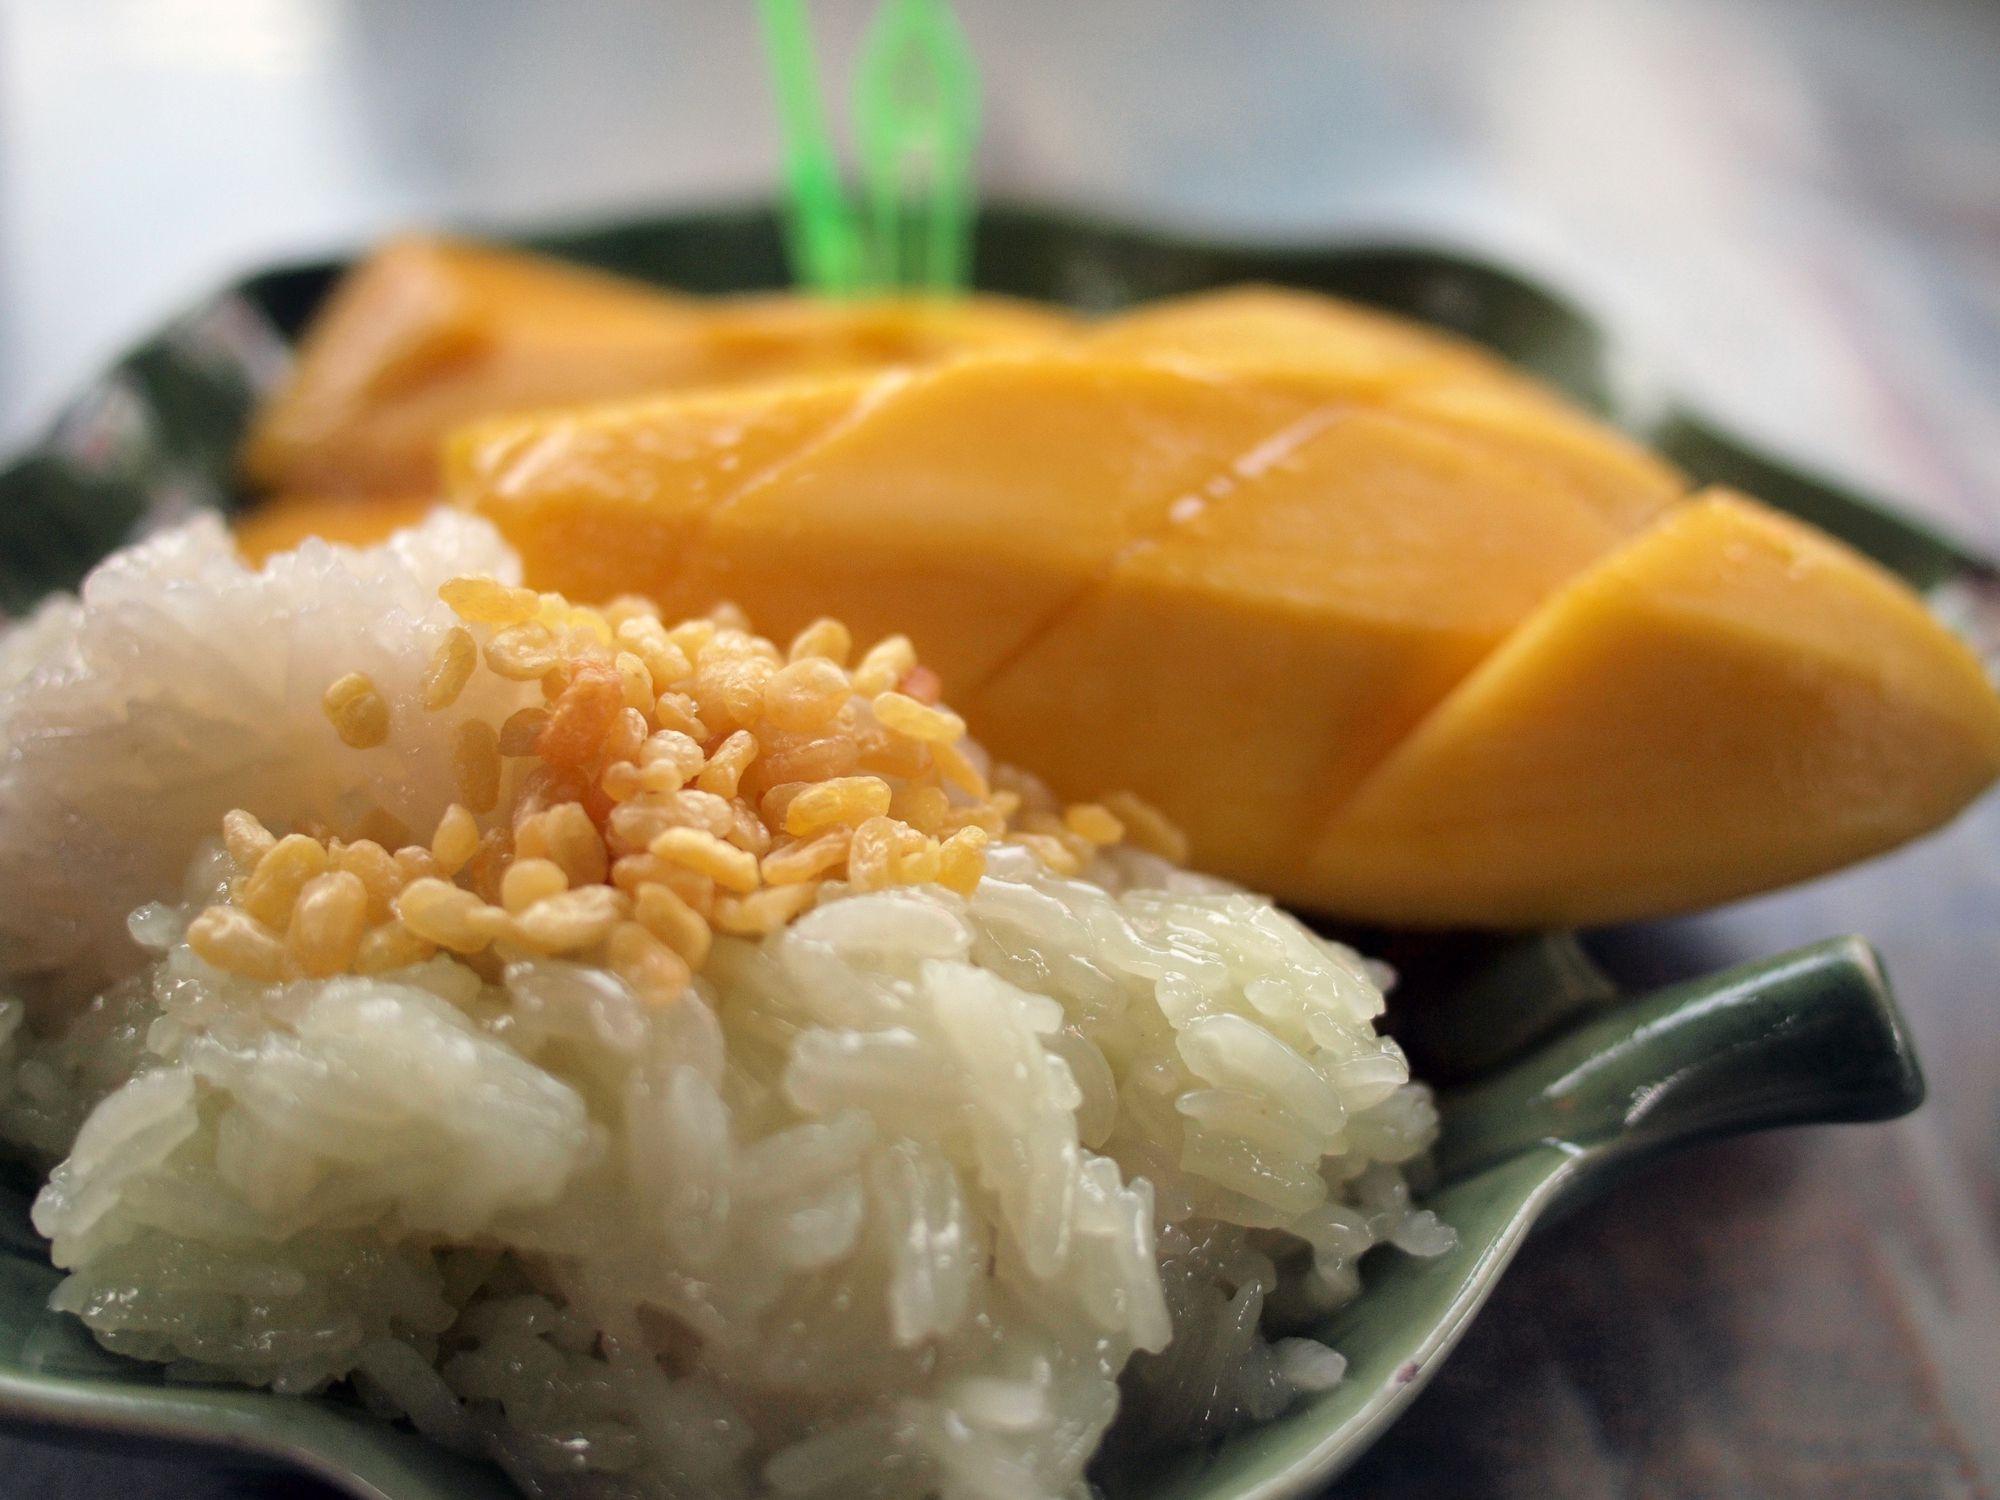 Thai Mango Sticky Rice Khao Niaow Ma Muang Recipe